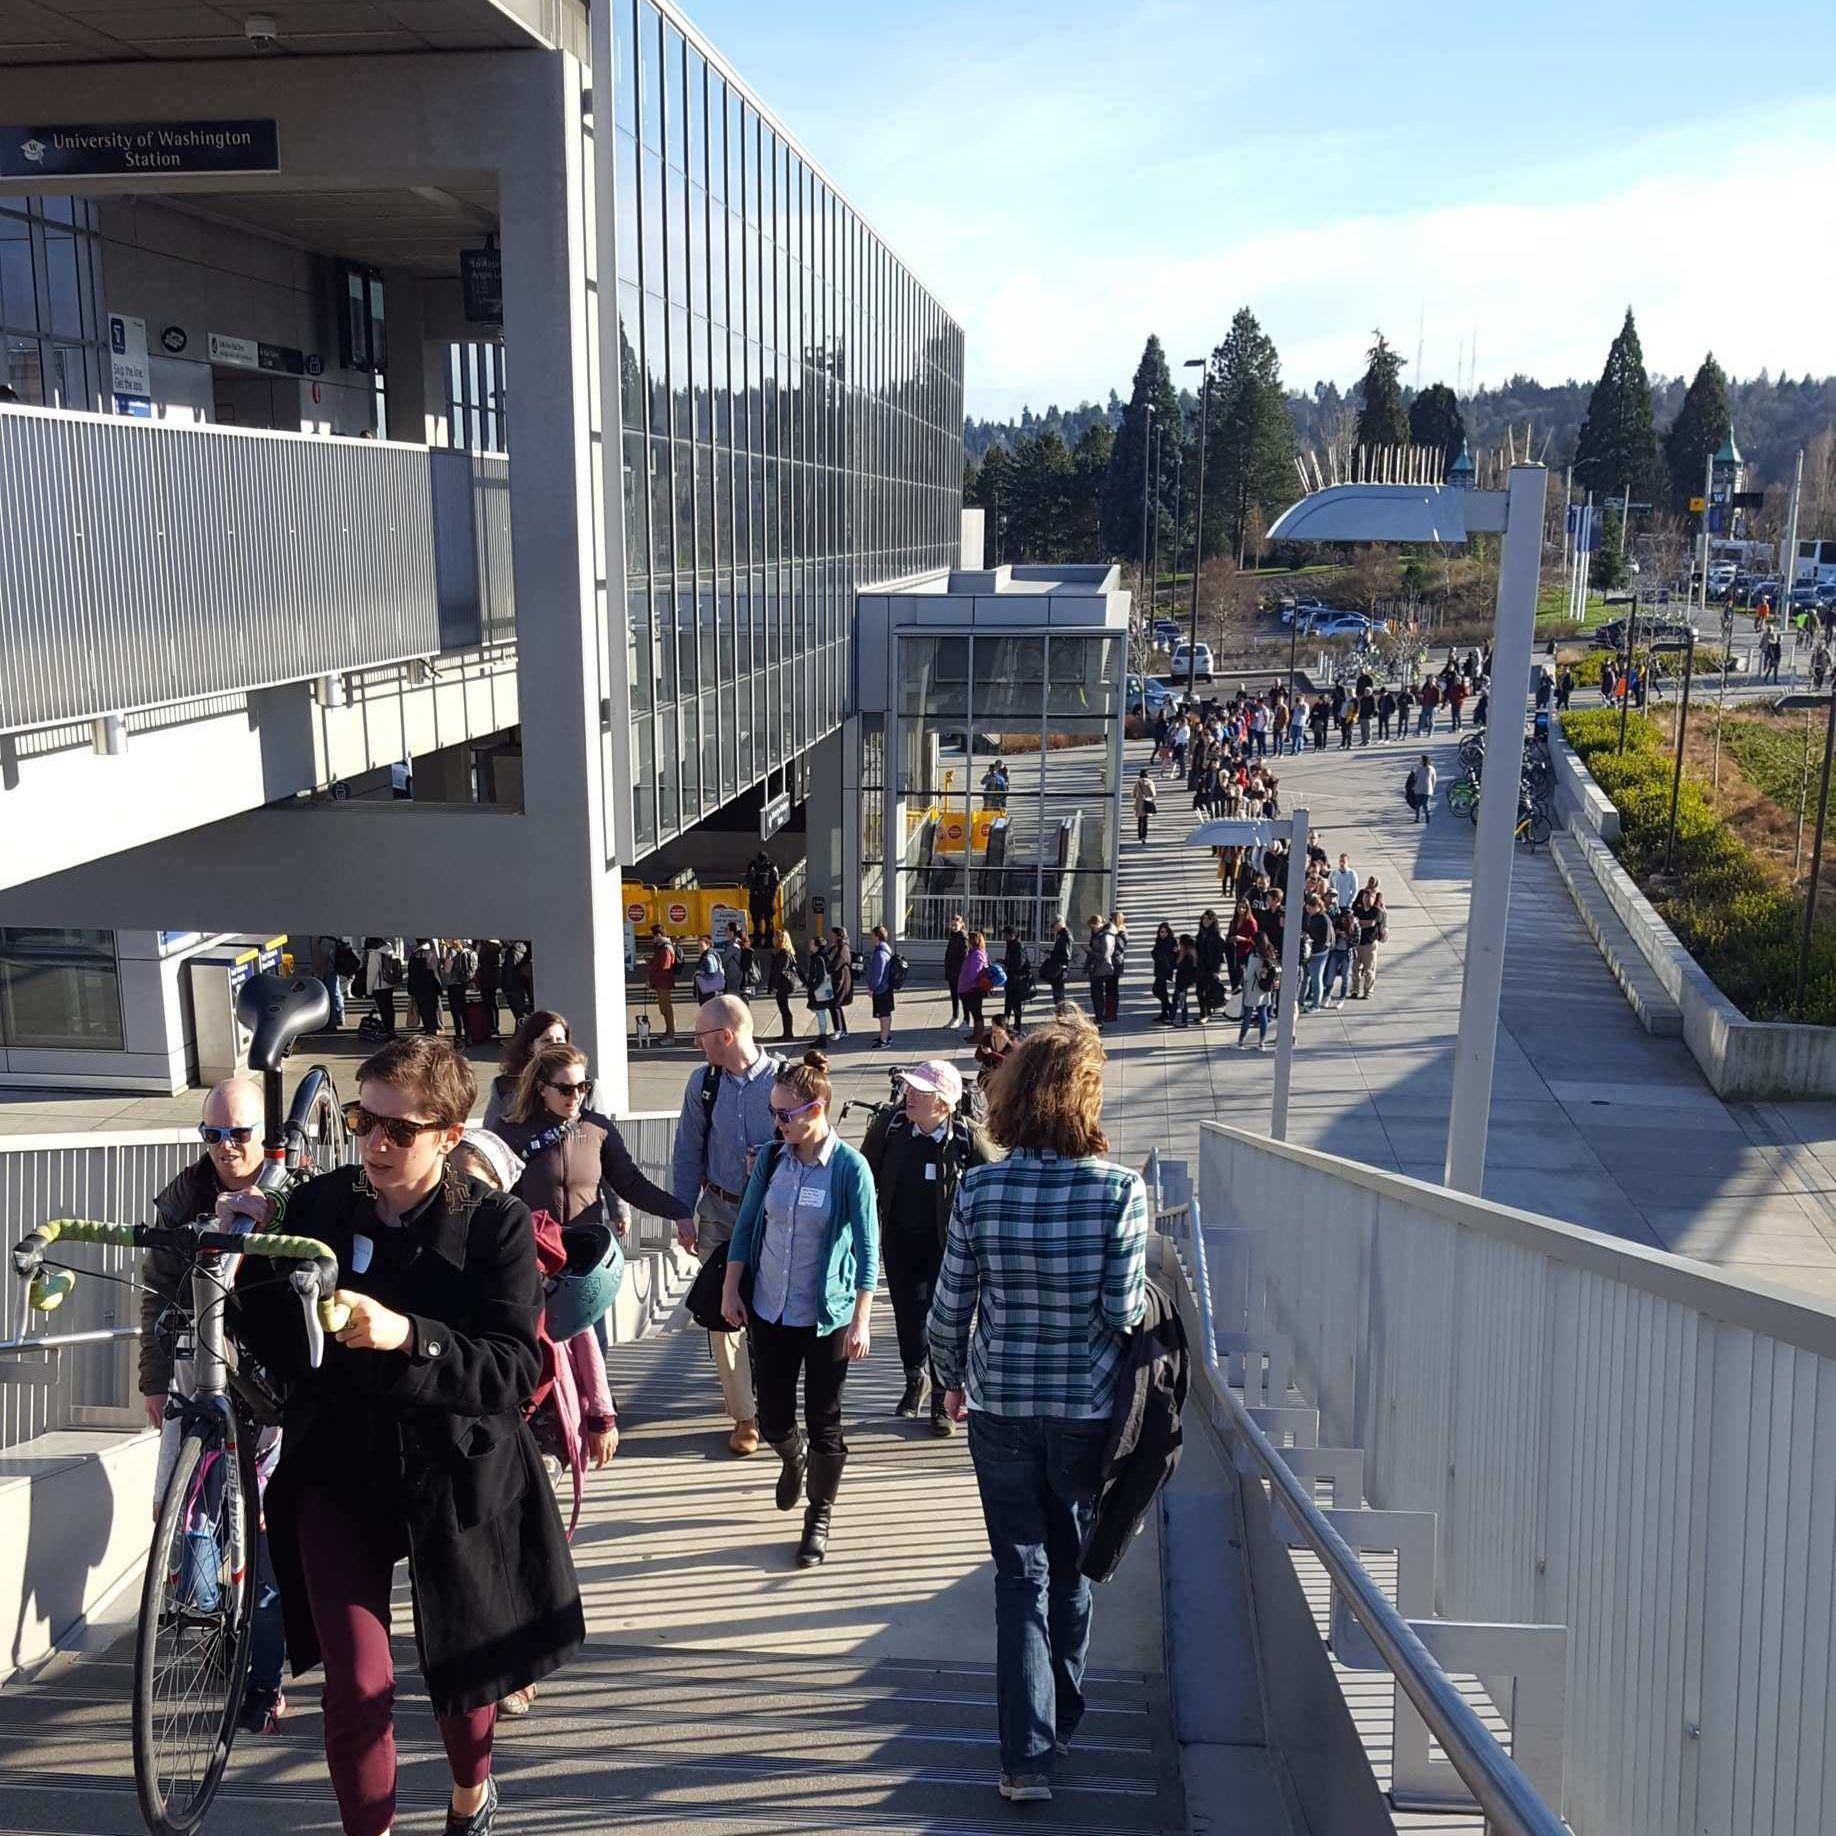 Line university of washington transit escalators stairs light rail vo0kpq